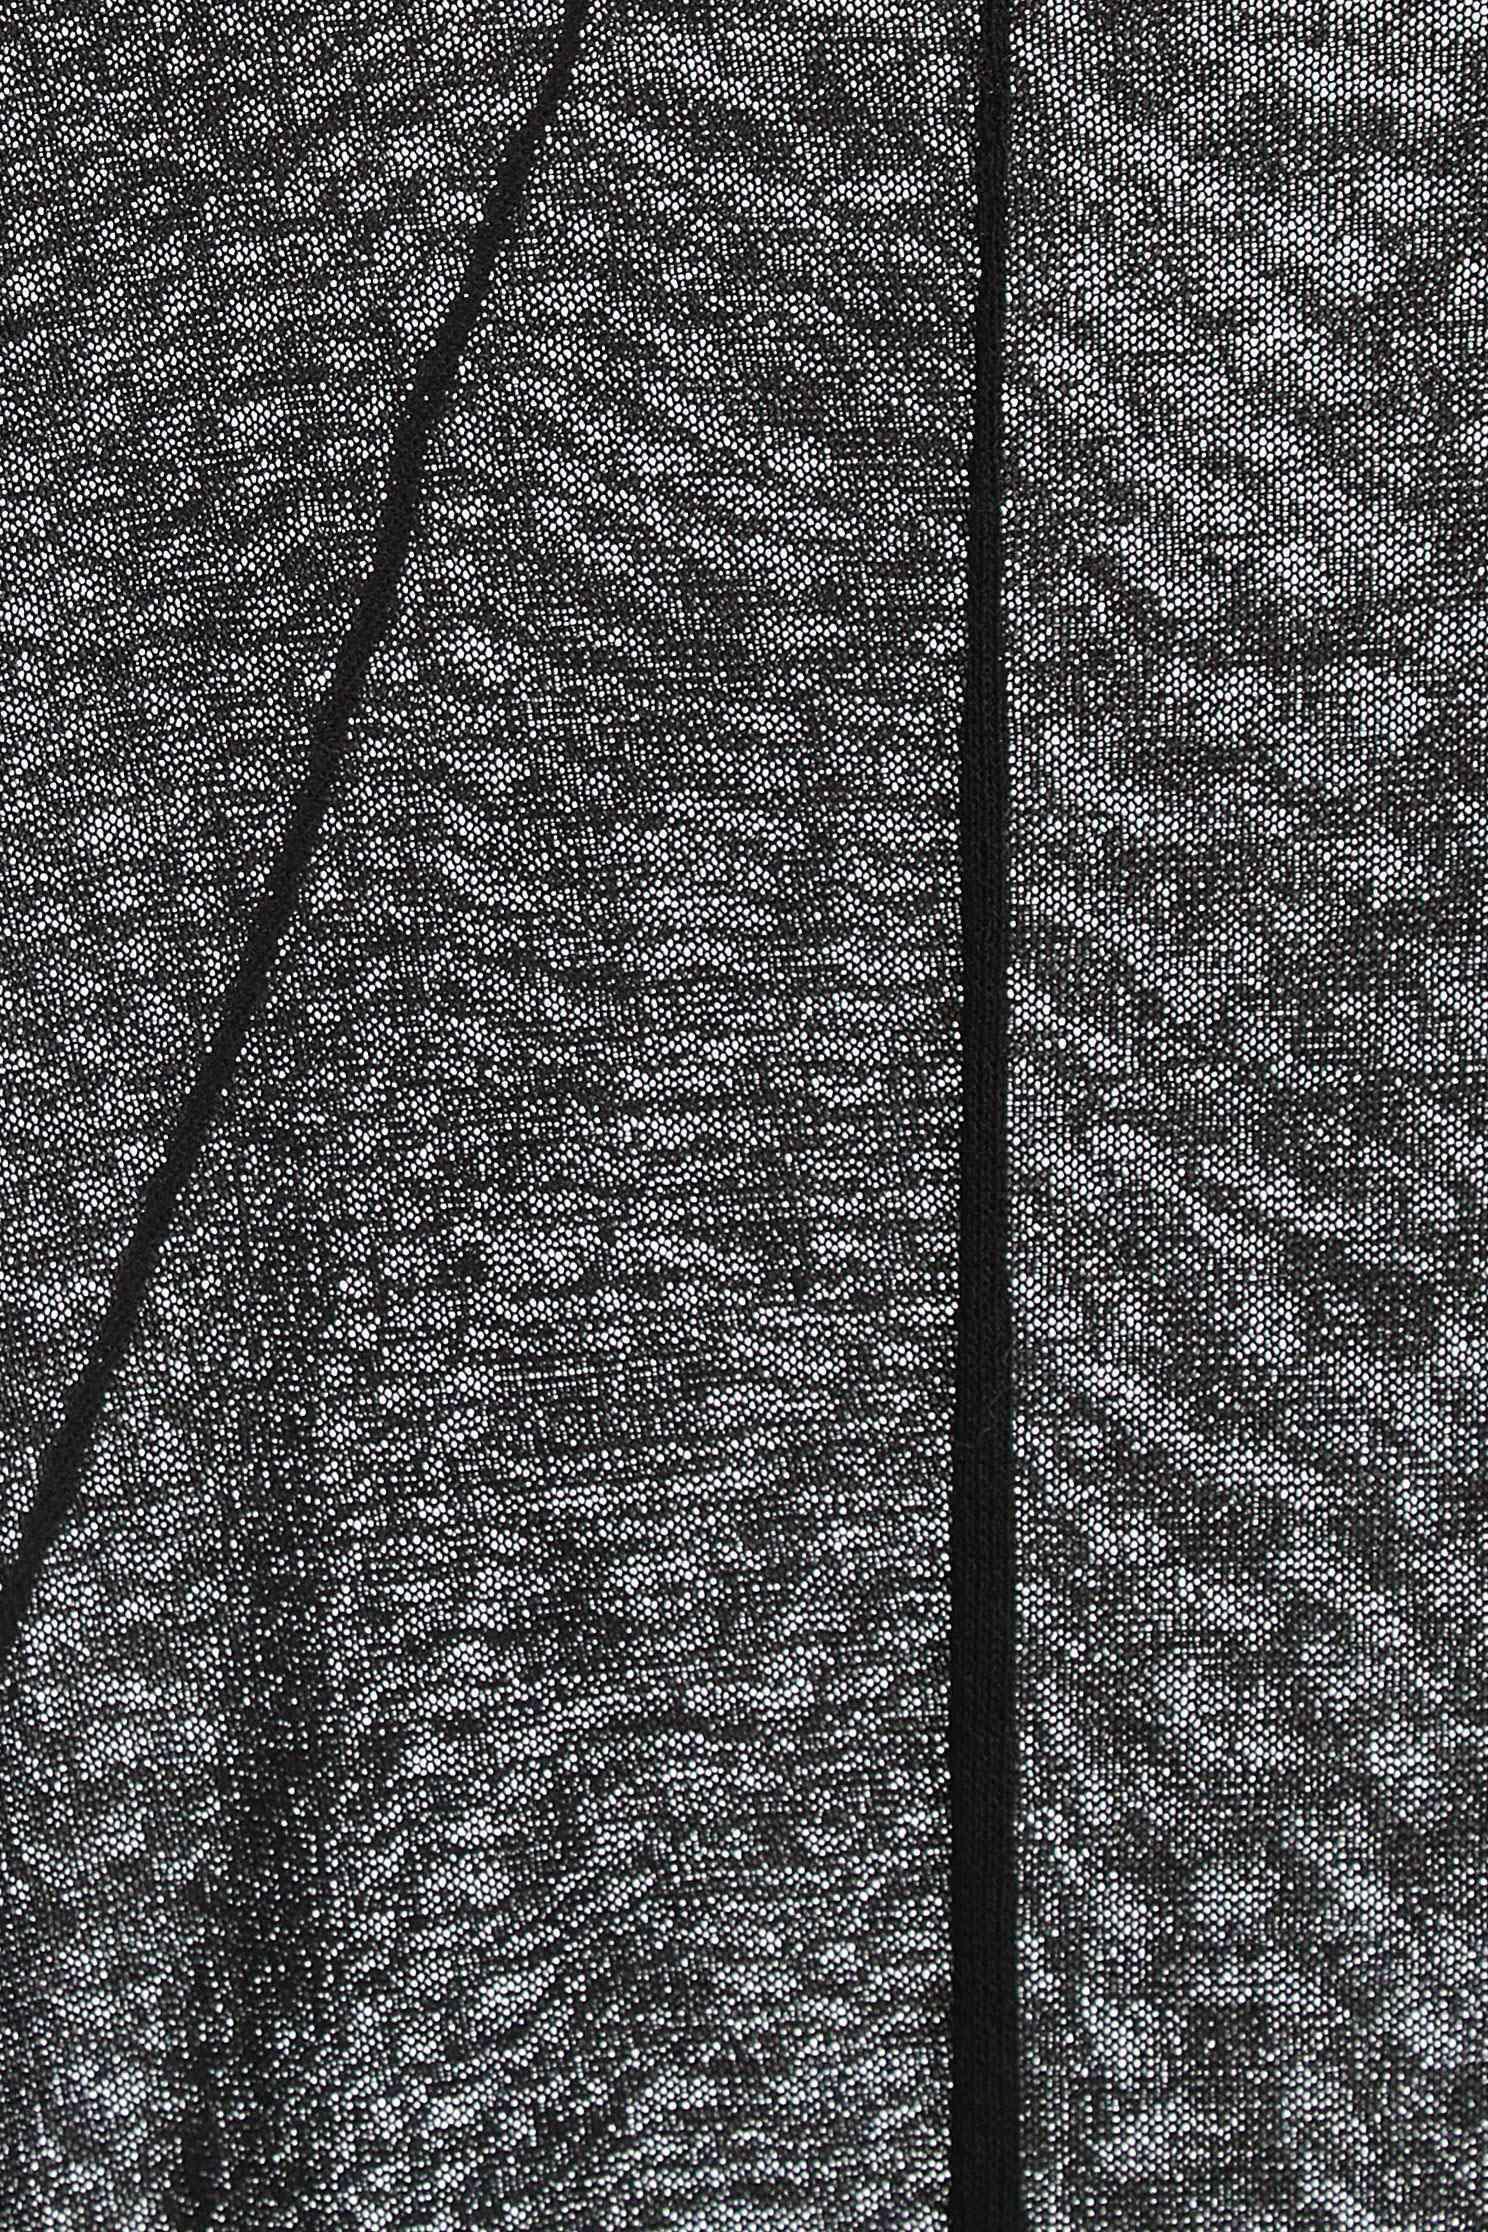 Short sleeve knitted top,Top,五分袖上衣,圓領上衣,Rayon,Fantasy purple,透膚上衣,knitting,Knitted top,Knitted Top,黑色上衣